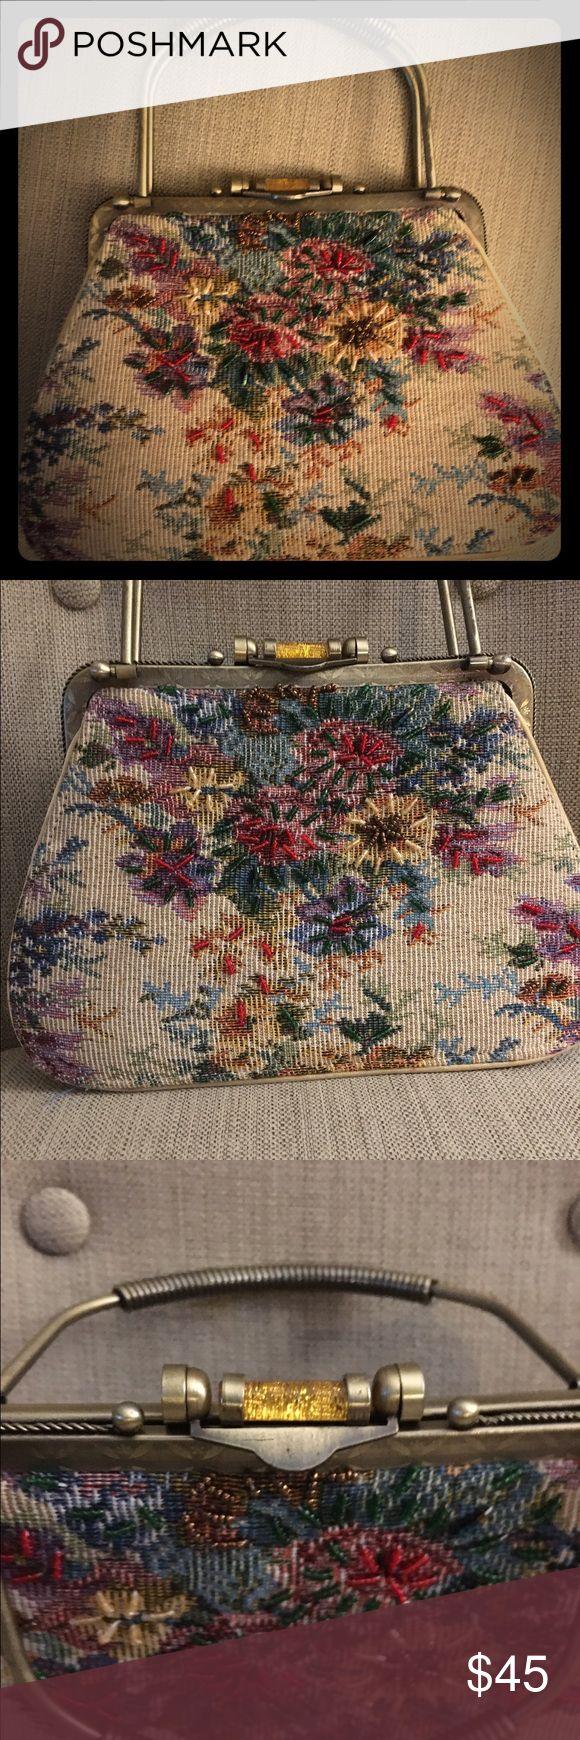 Vintage 1950 tapestry purse Vintage 1950 tapestry purse.  Metal handle I'm great condition Authentic Original Vintage Style Bags Clutches & Wristlets